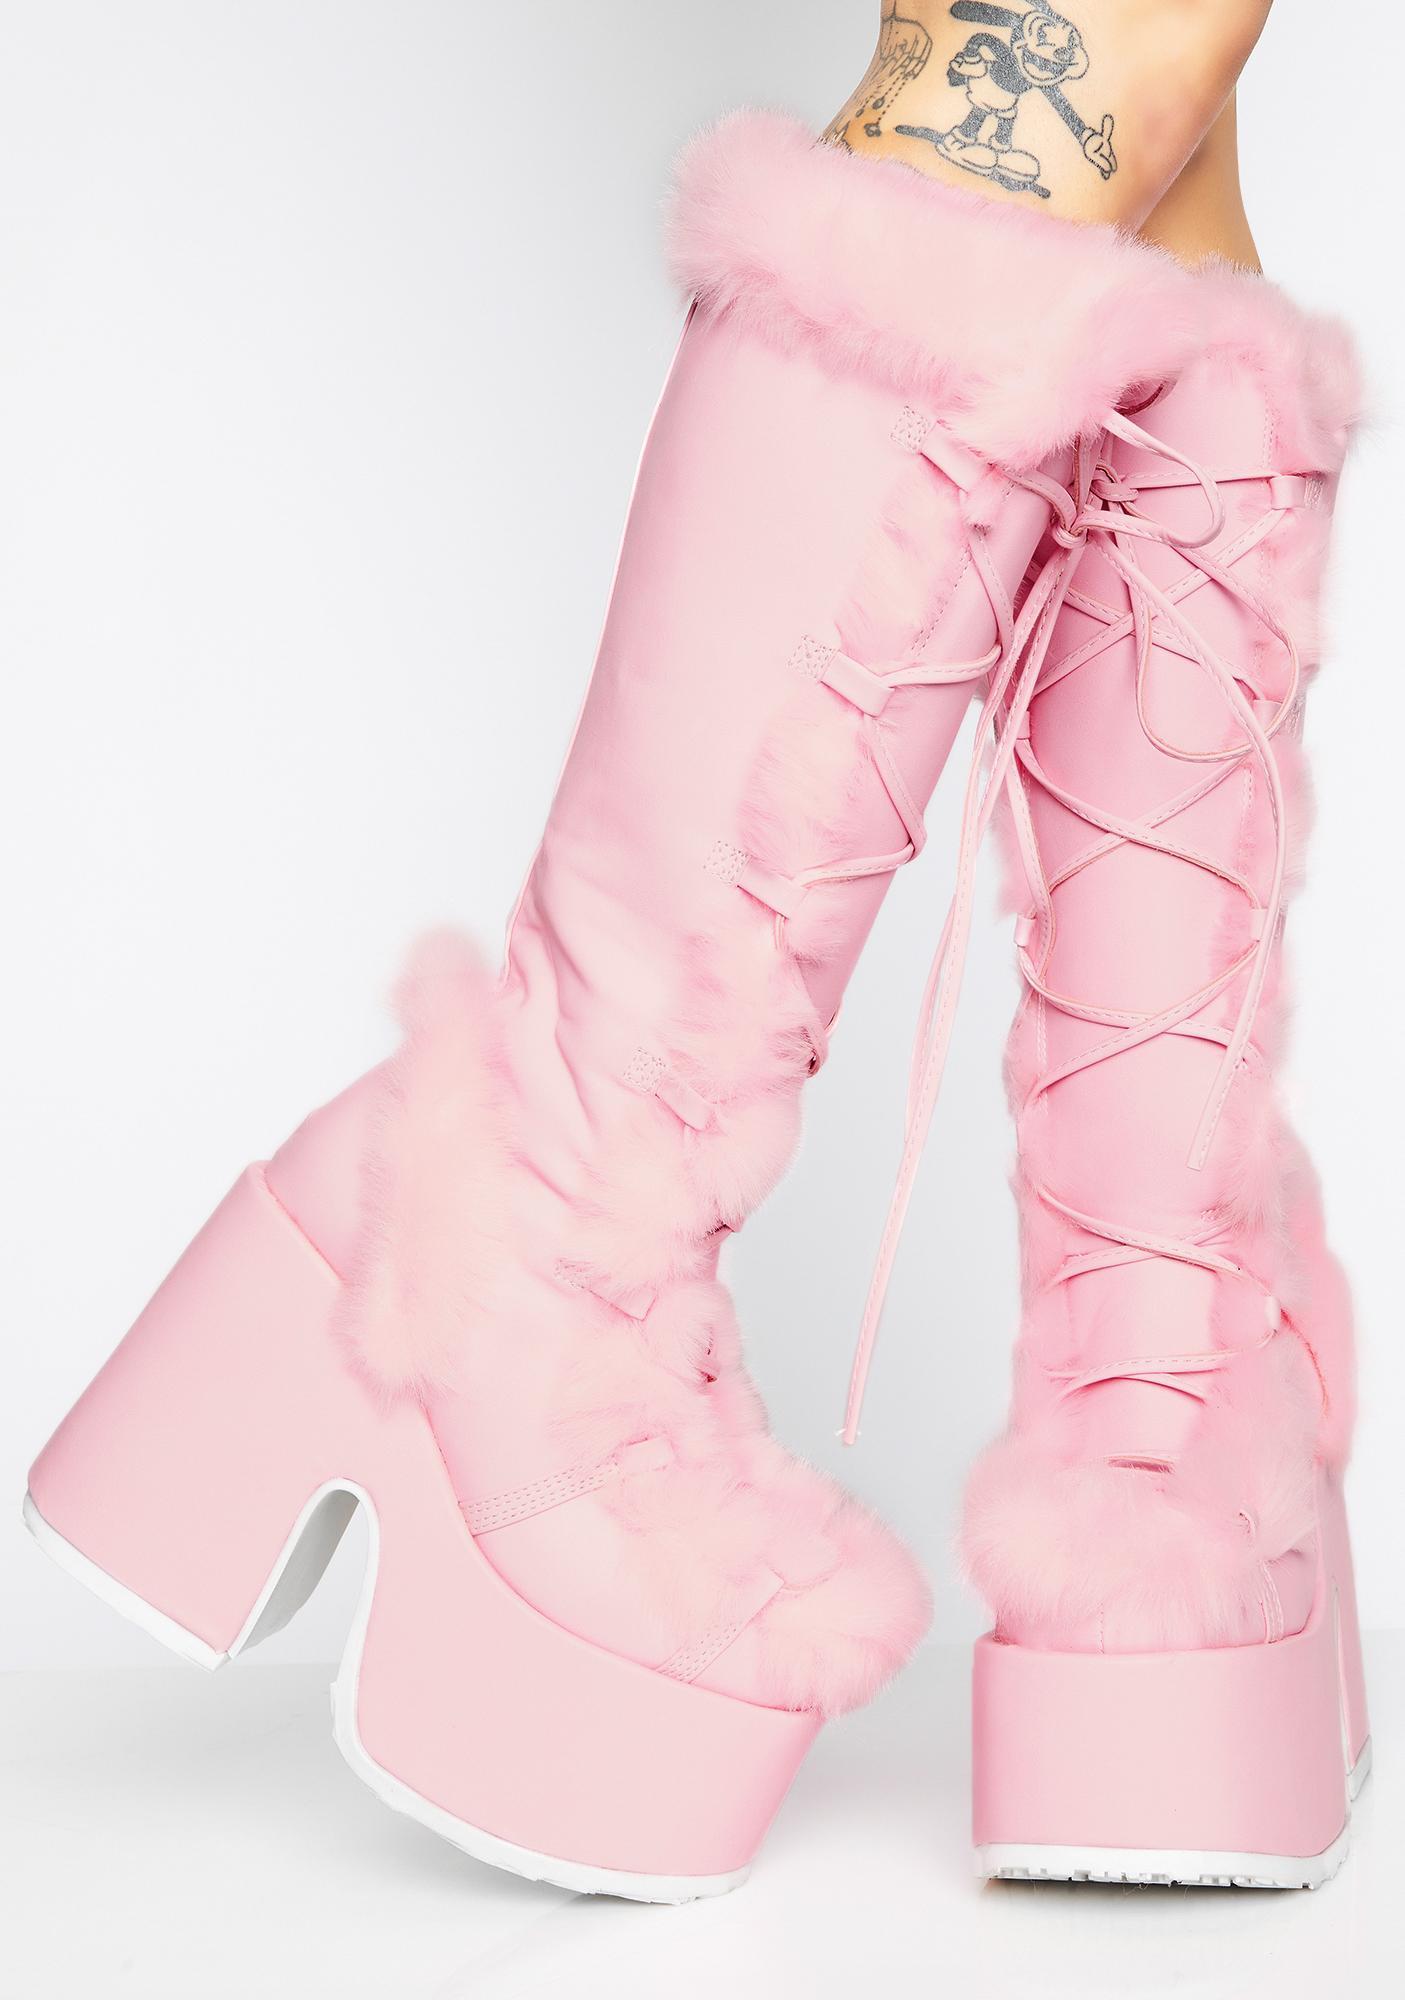 611470107d2 Demonia Sweet Pure Vigilance Platform Boots